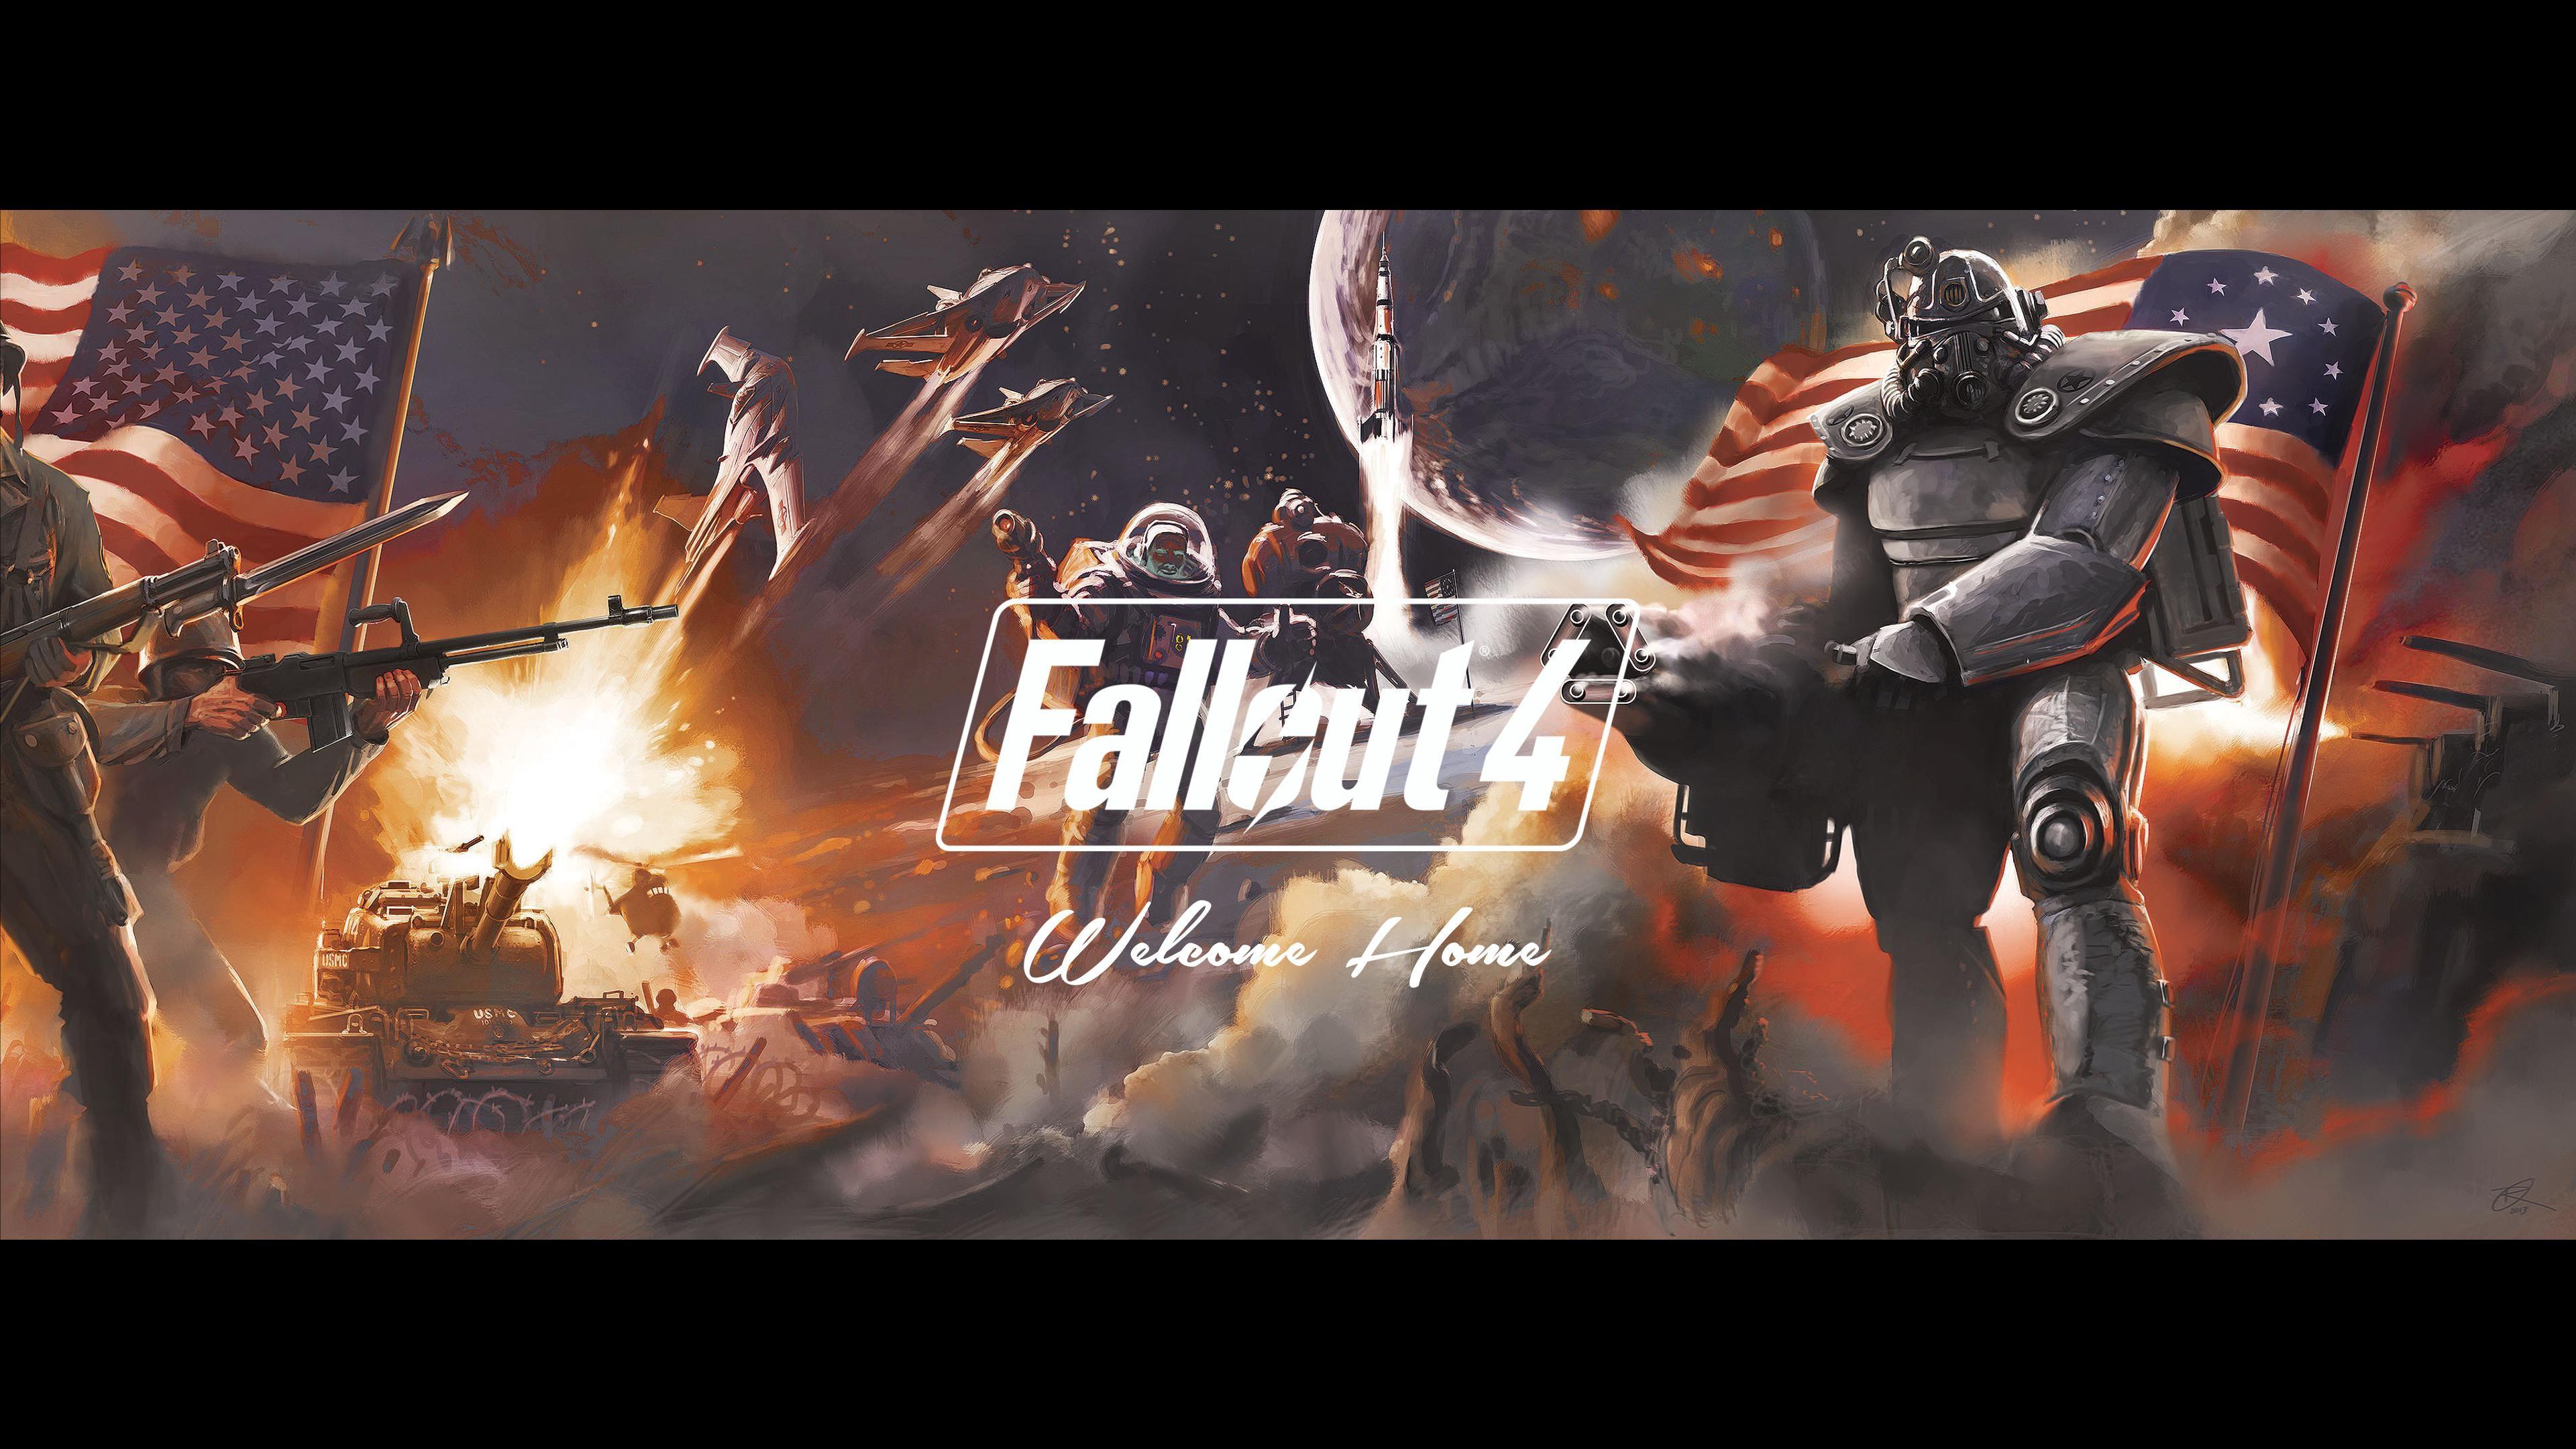 Fallout 4 wallpapers (desktop)